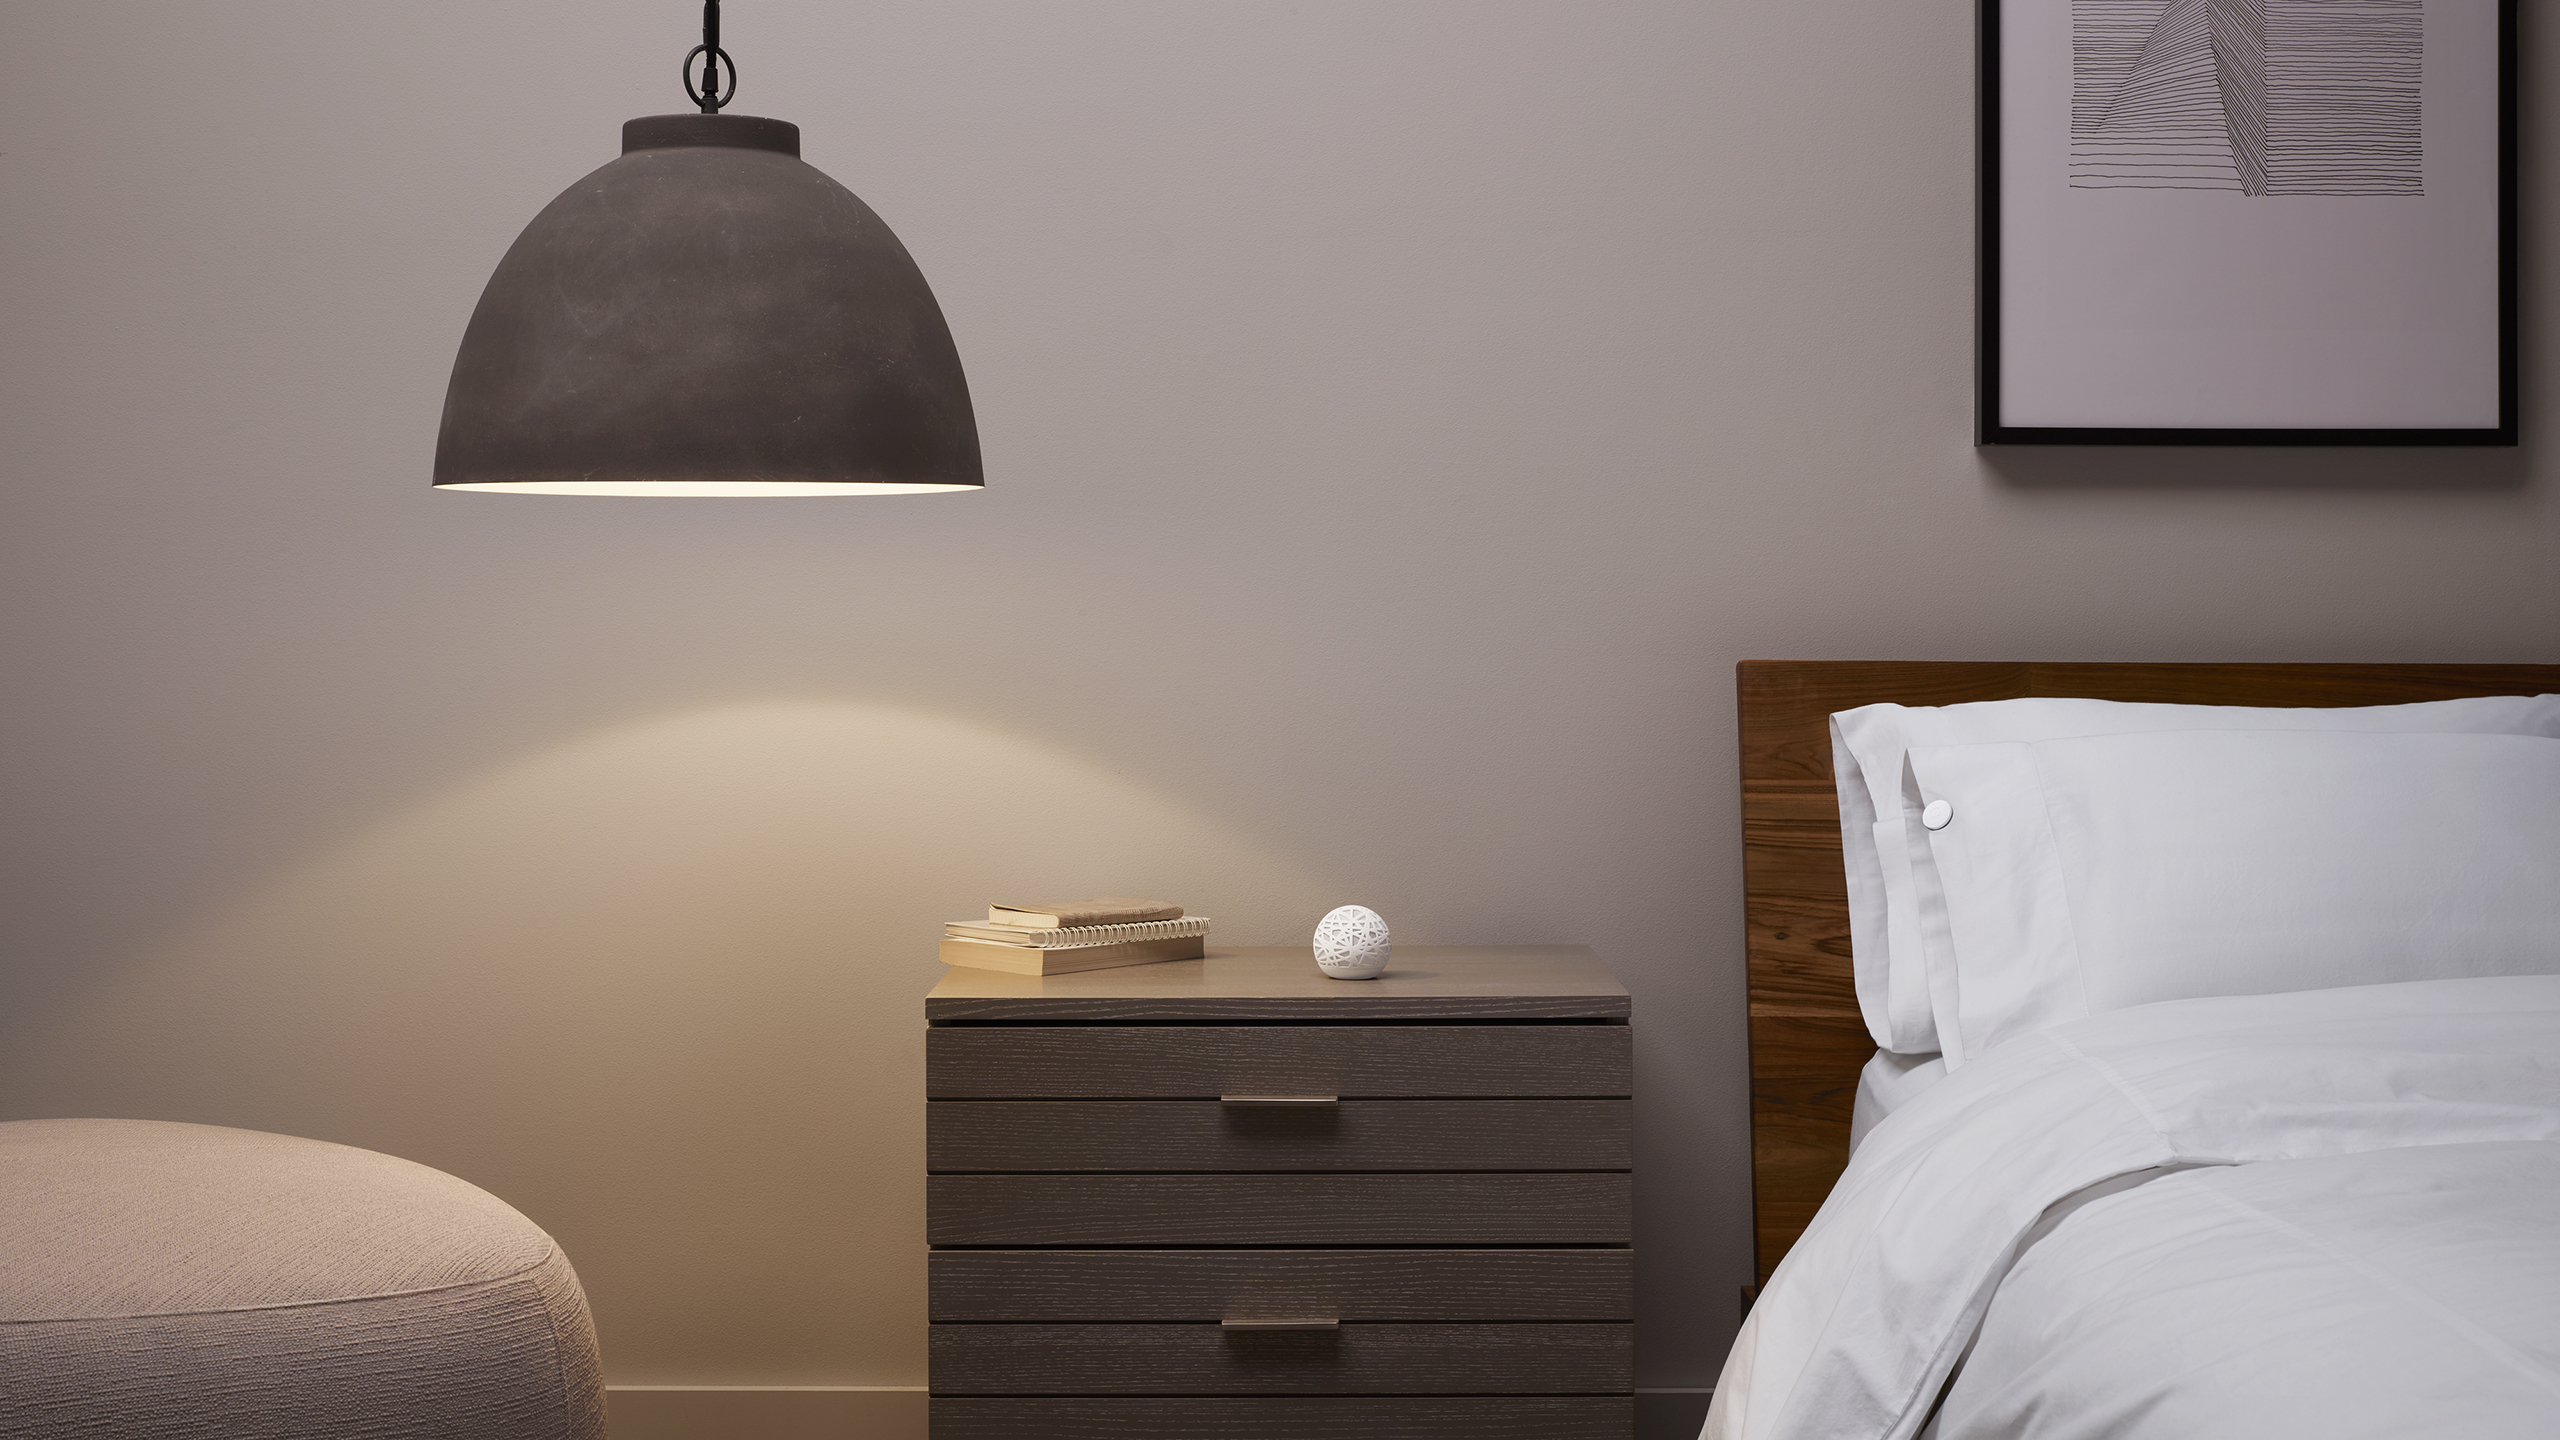 Sense by Hello Smart Alarm and Sleep Tracker